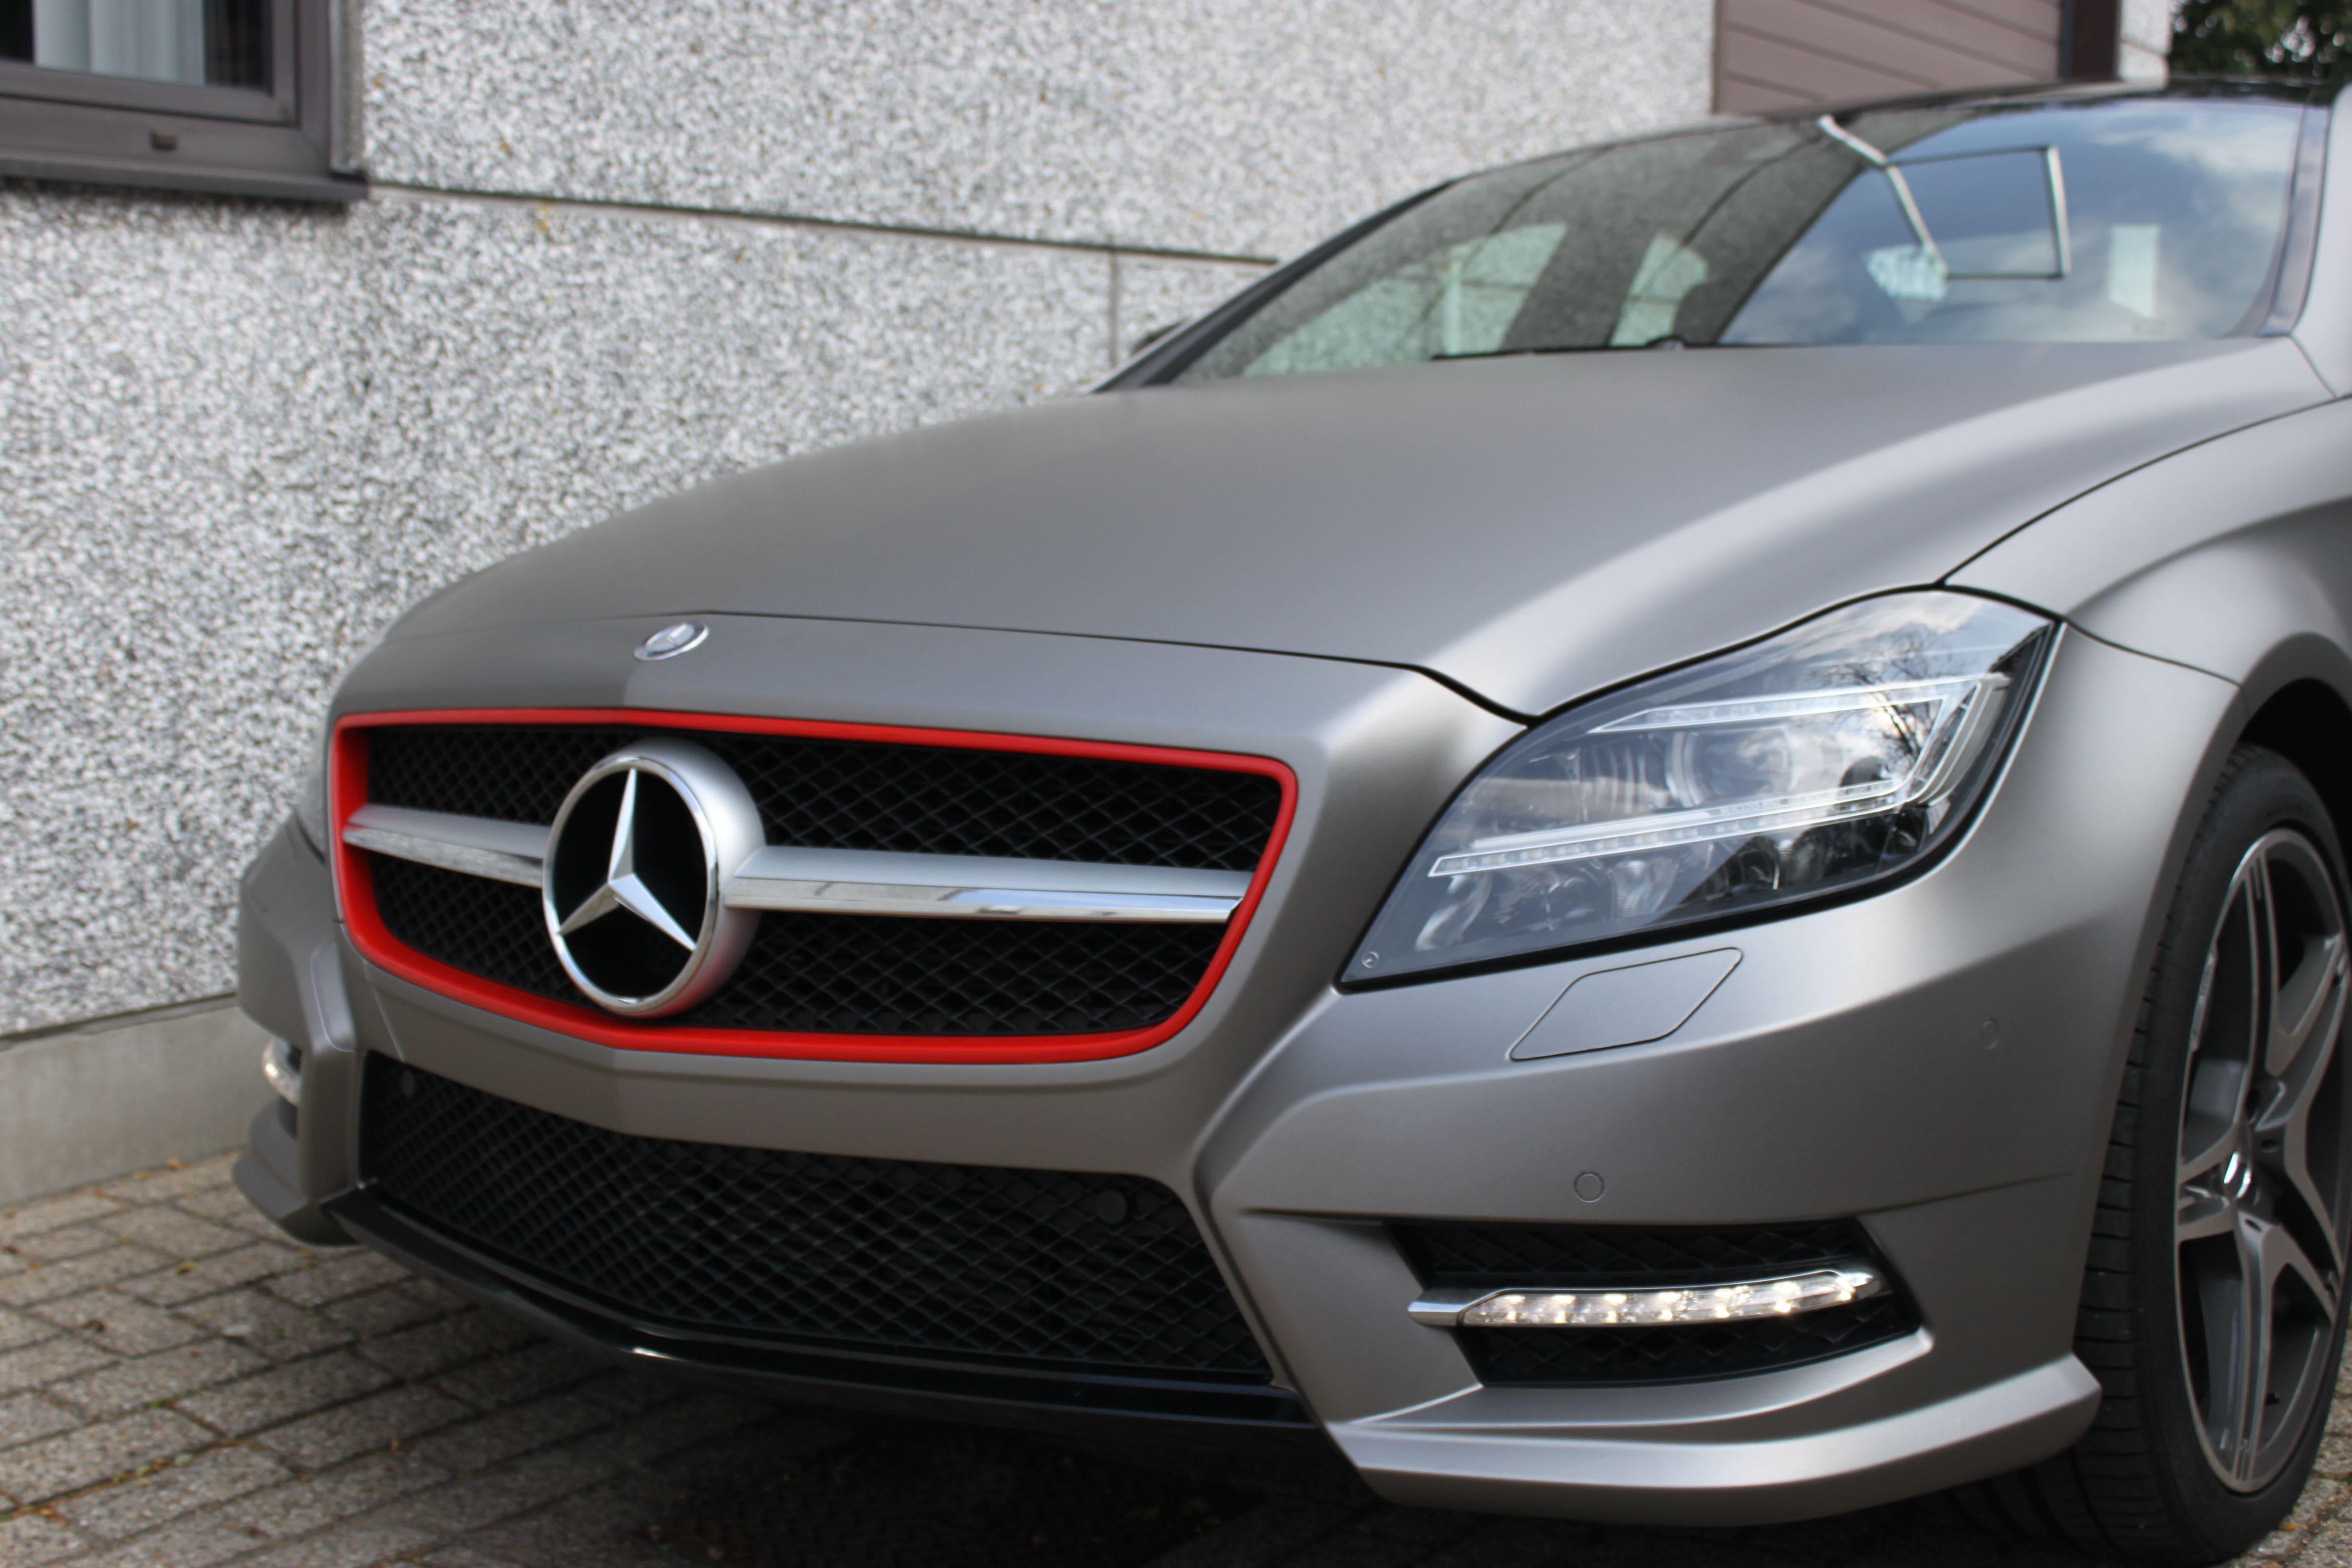 Mercedes CLS met Mat Grey Aluminium Wrap, Carwrapping door Wrapmyride.nu Foto-nr:6144, ©2020